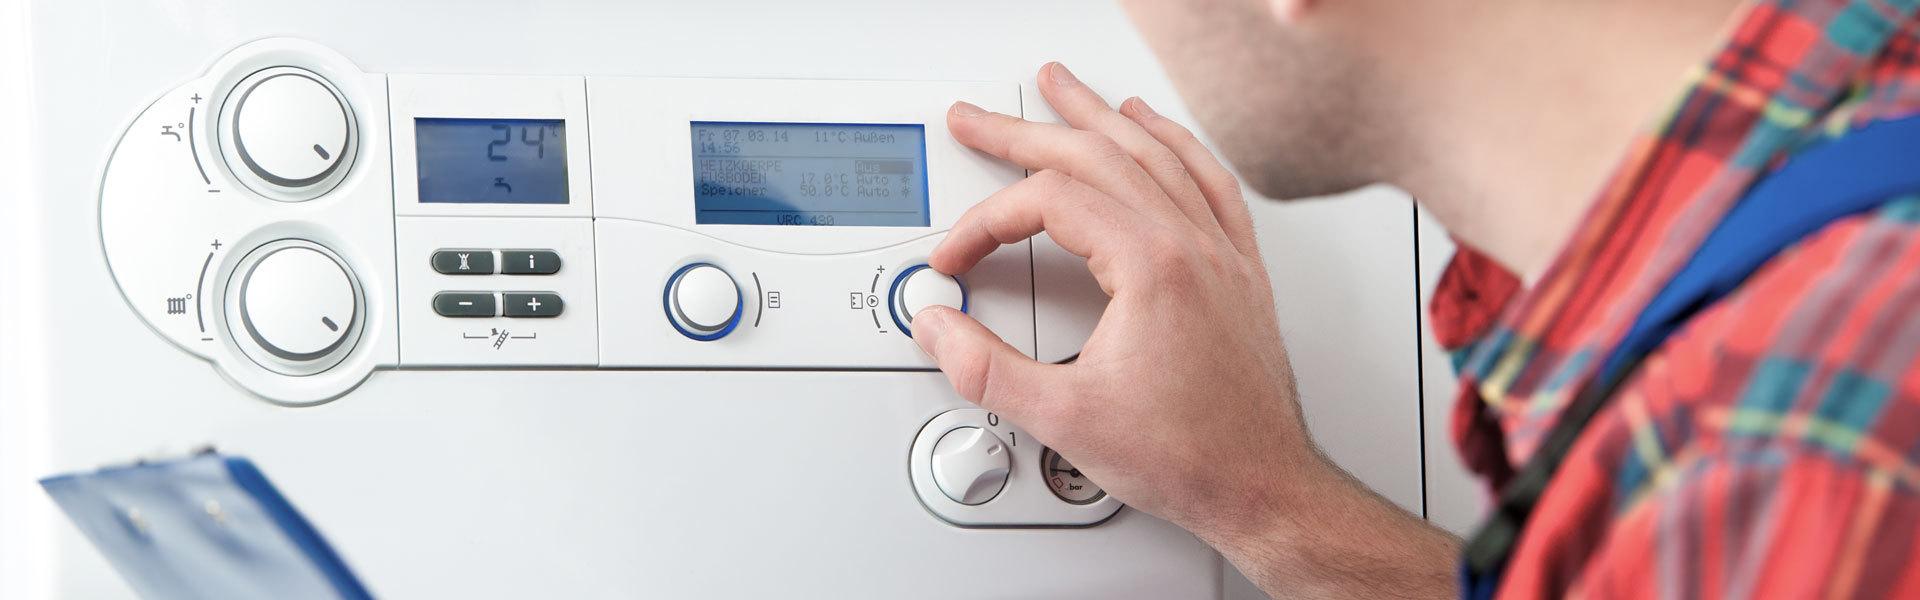 Servicio Técnico de Electrodomésticos Balay en Sevilla